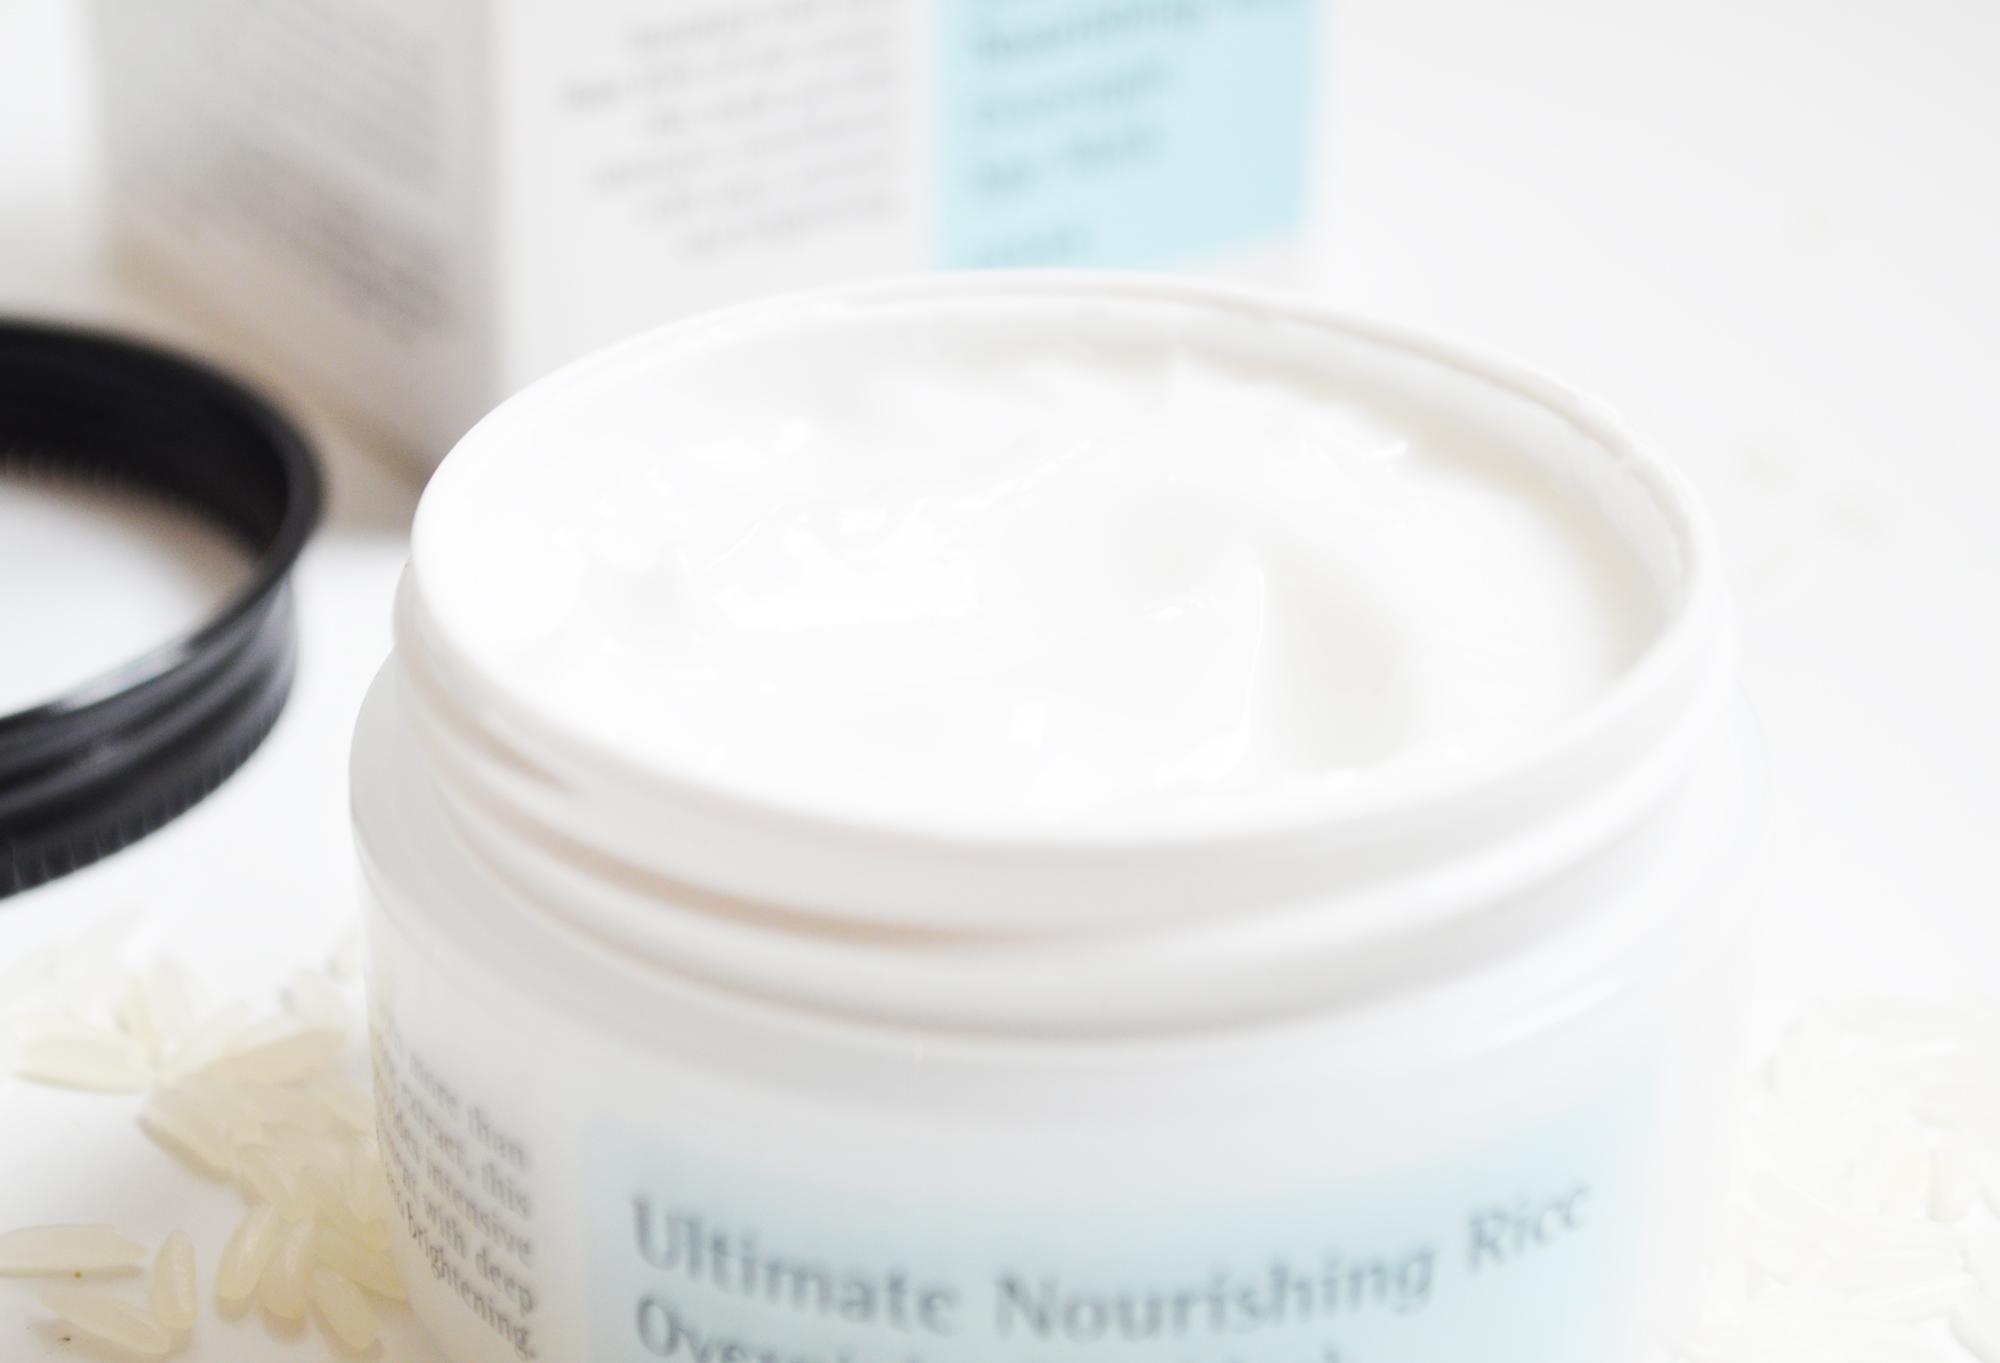 masque-de-nuit-nourrissant-Cosrx-Ultimate-nourishing-rice-Overnight-spa-Mask